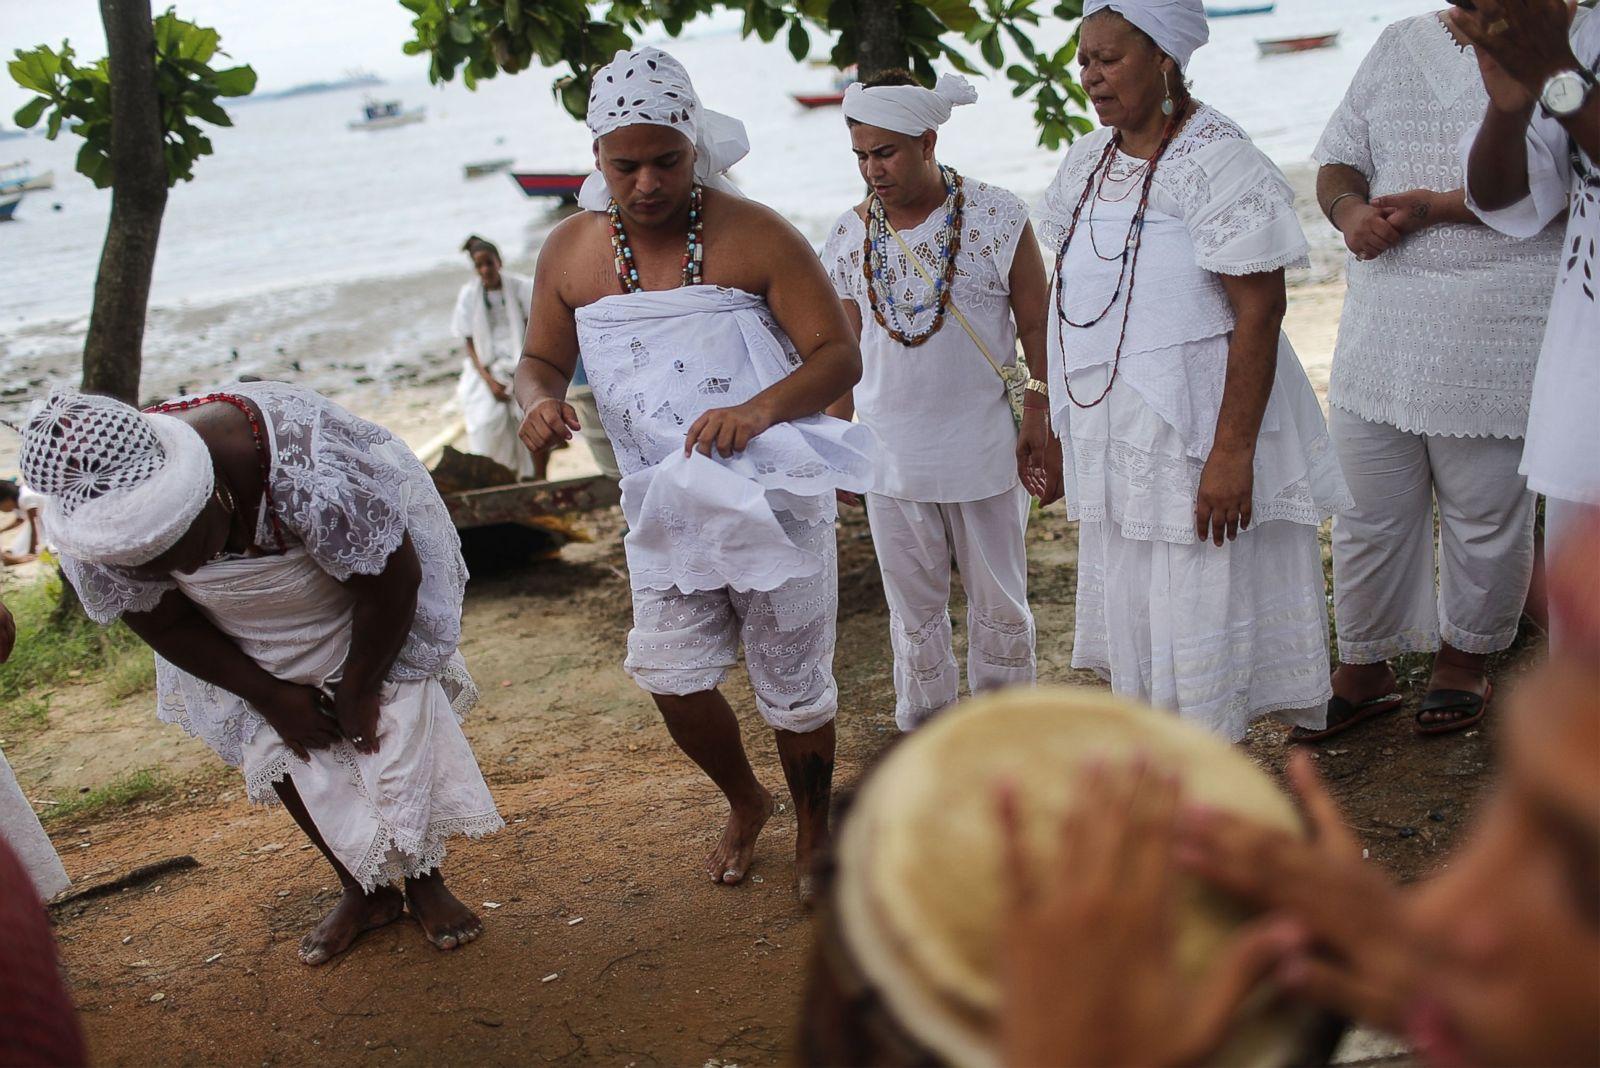 Brazilian Candomble Ceremonies Honor Goddesses Lemanja and Oxum ...